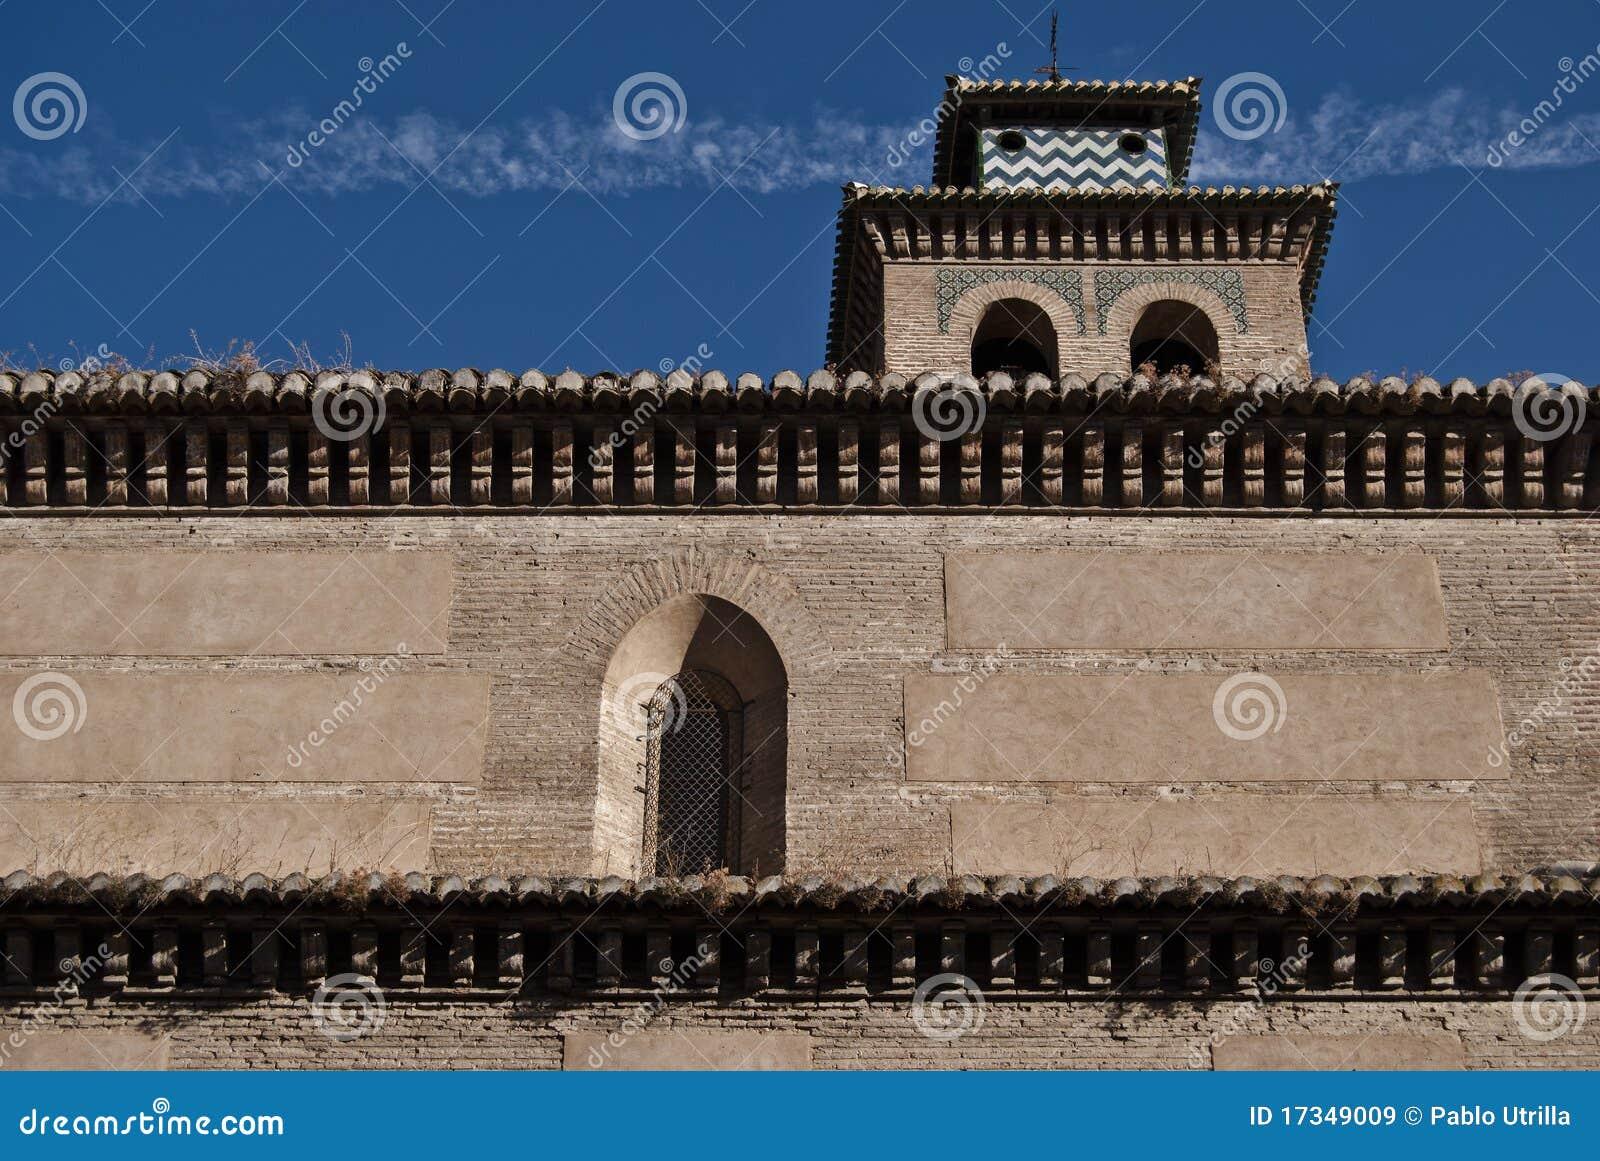 Church of santa ana granada royalty free stock images - Santa ana granada ...